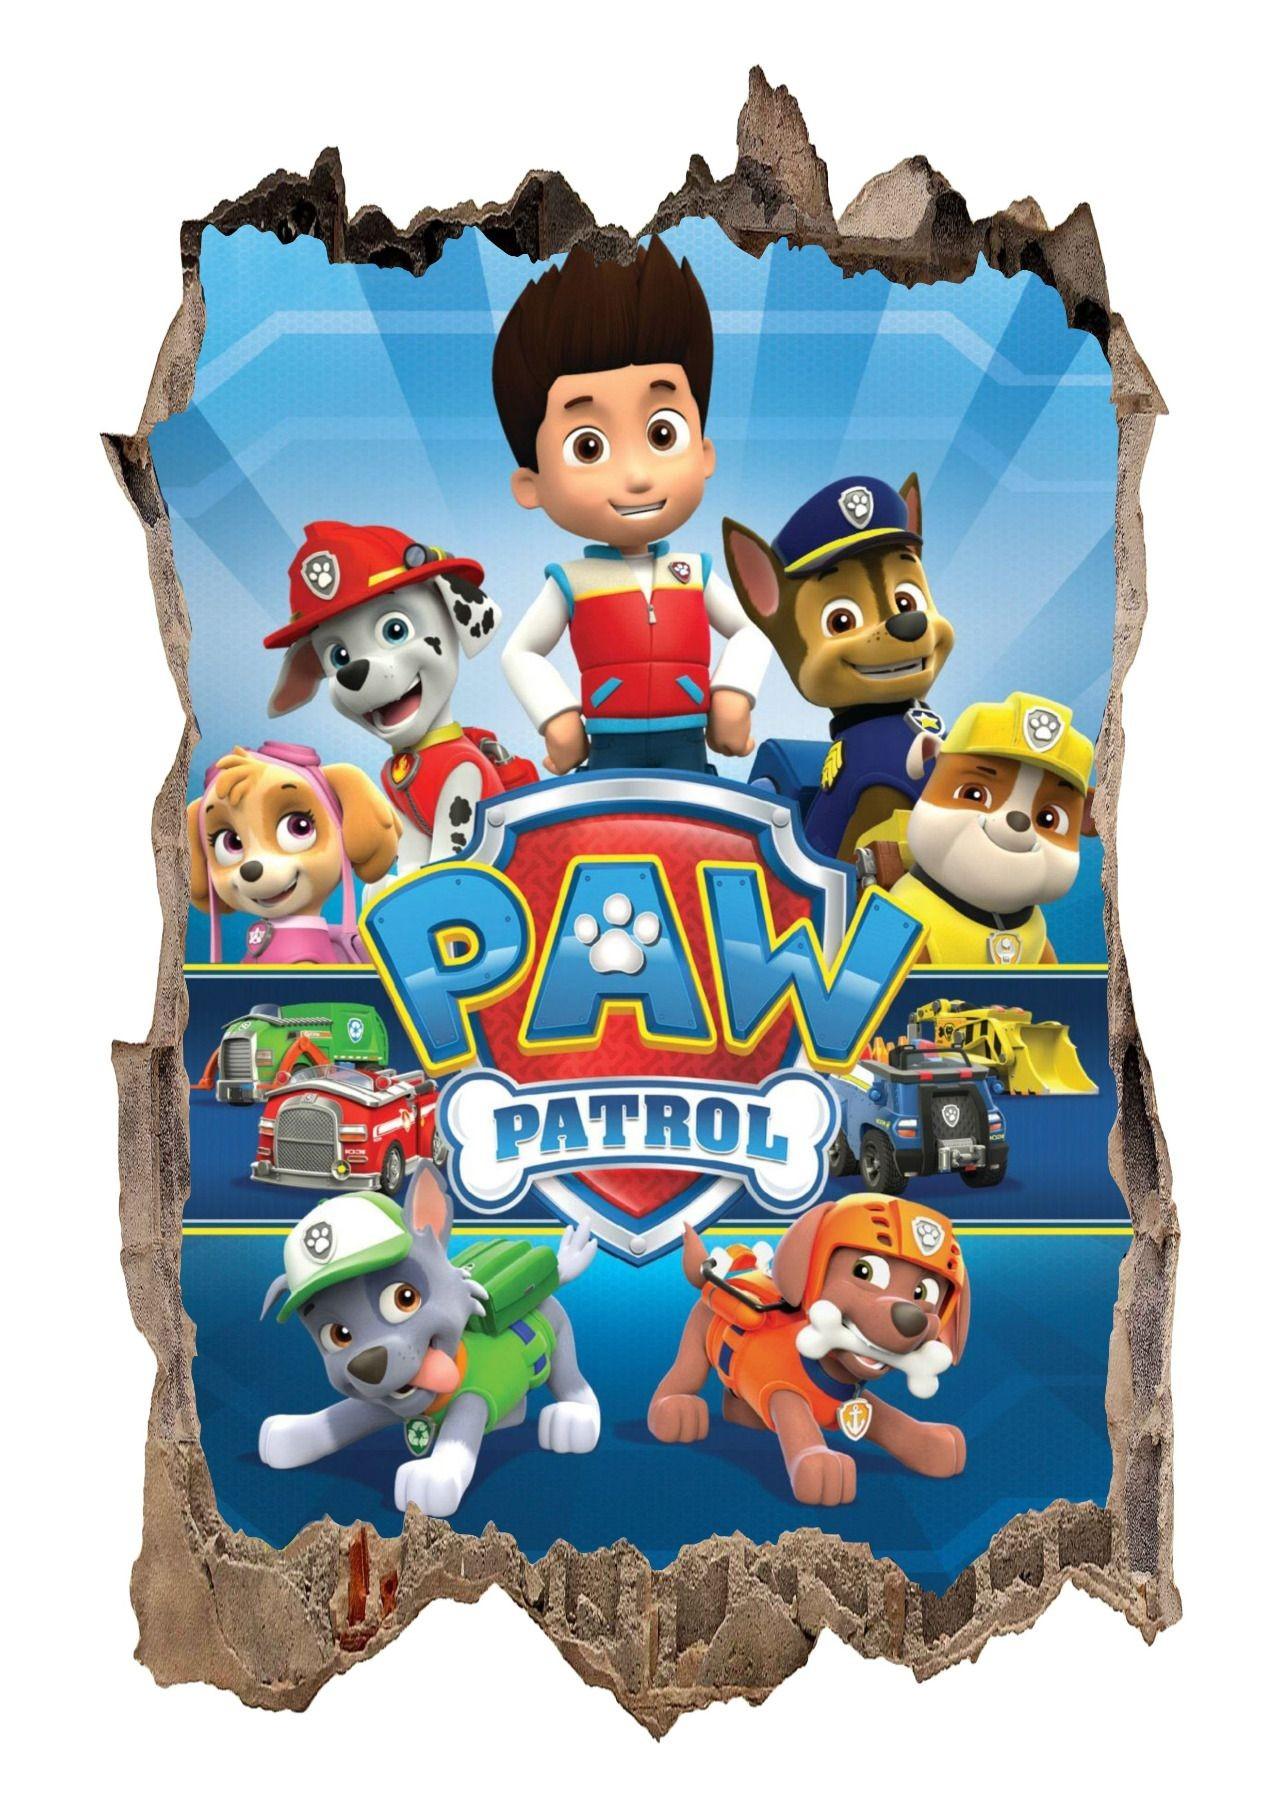 DomTextilu DomTextilu Nálepka na stenu Paw Patrol 3D 47x73cm 41791 Modrá